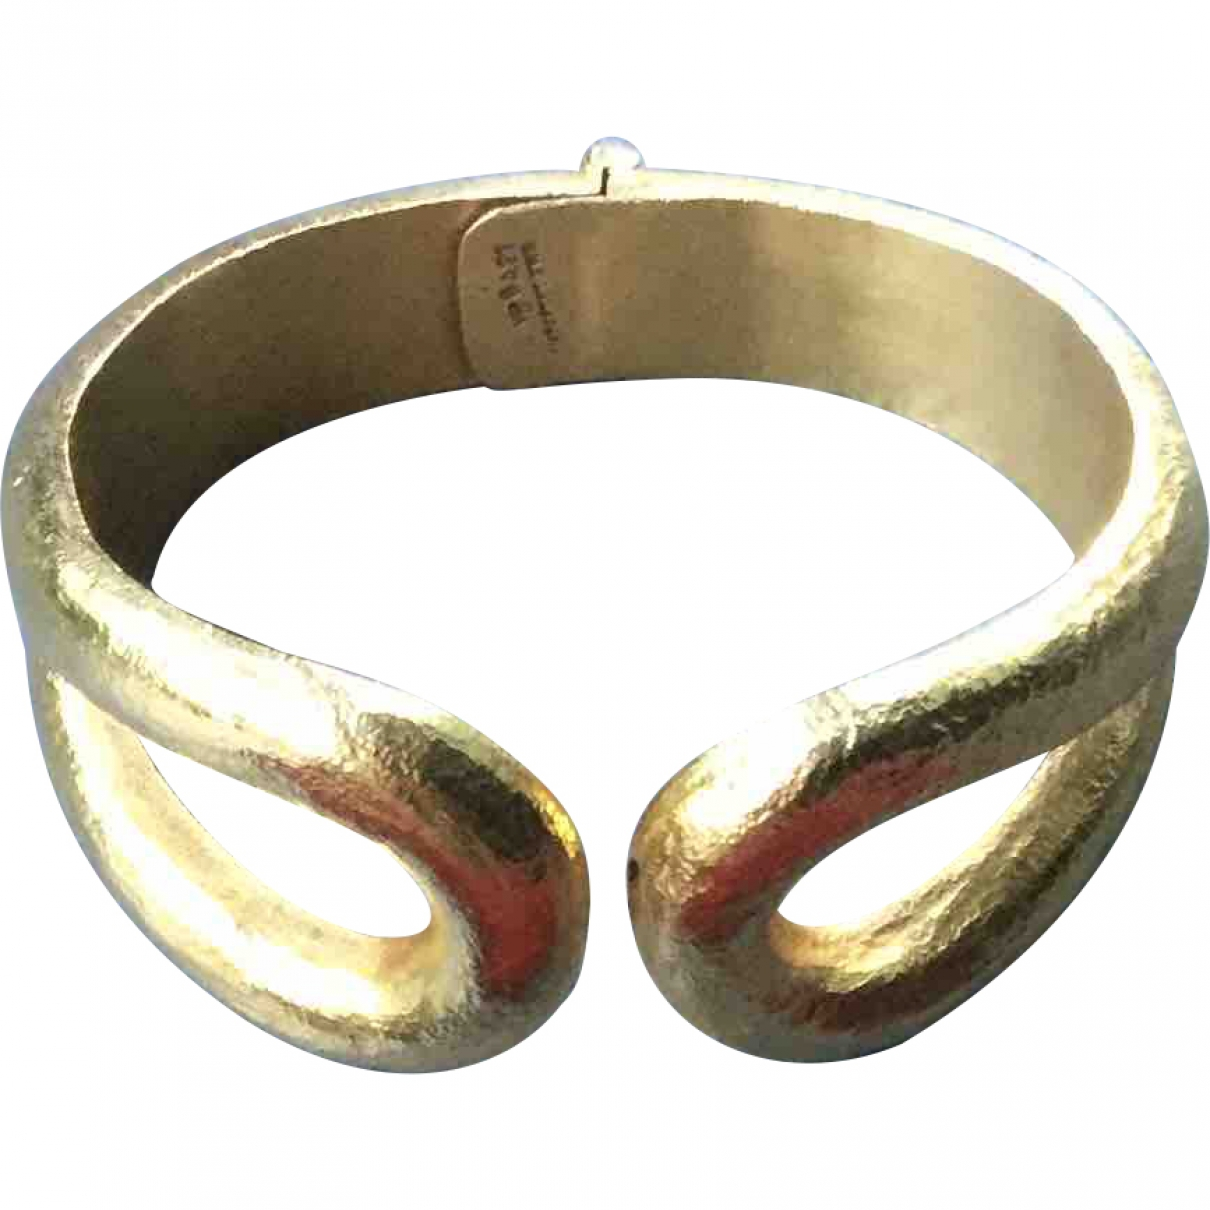 Ilias Lalaounis \N Gold Yellow gold bracelet for Women \N